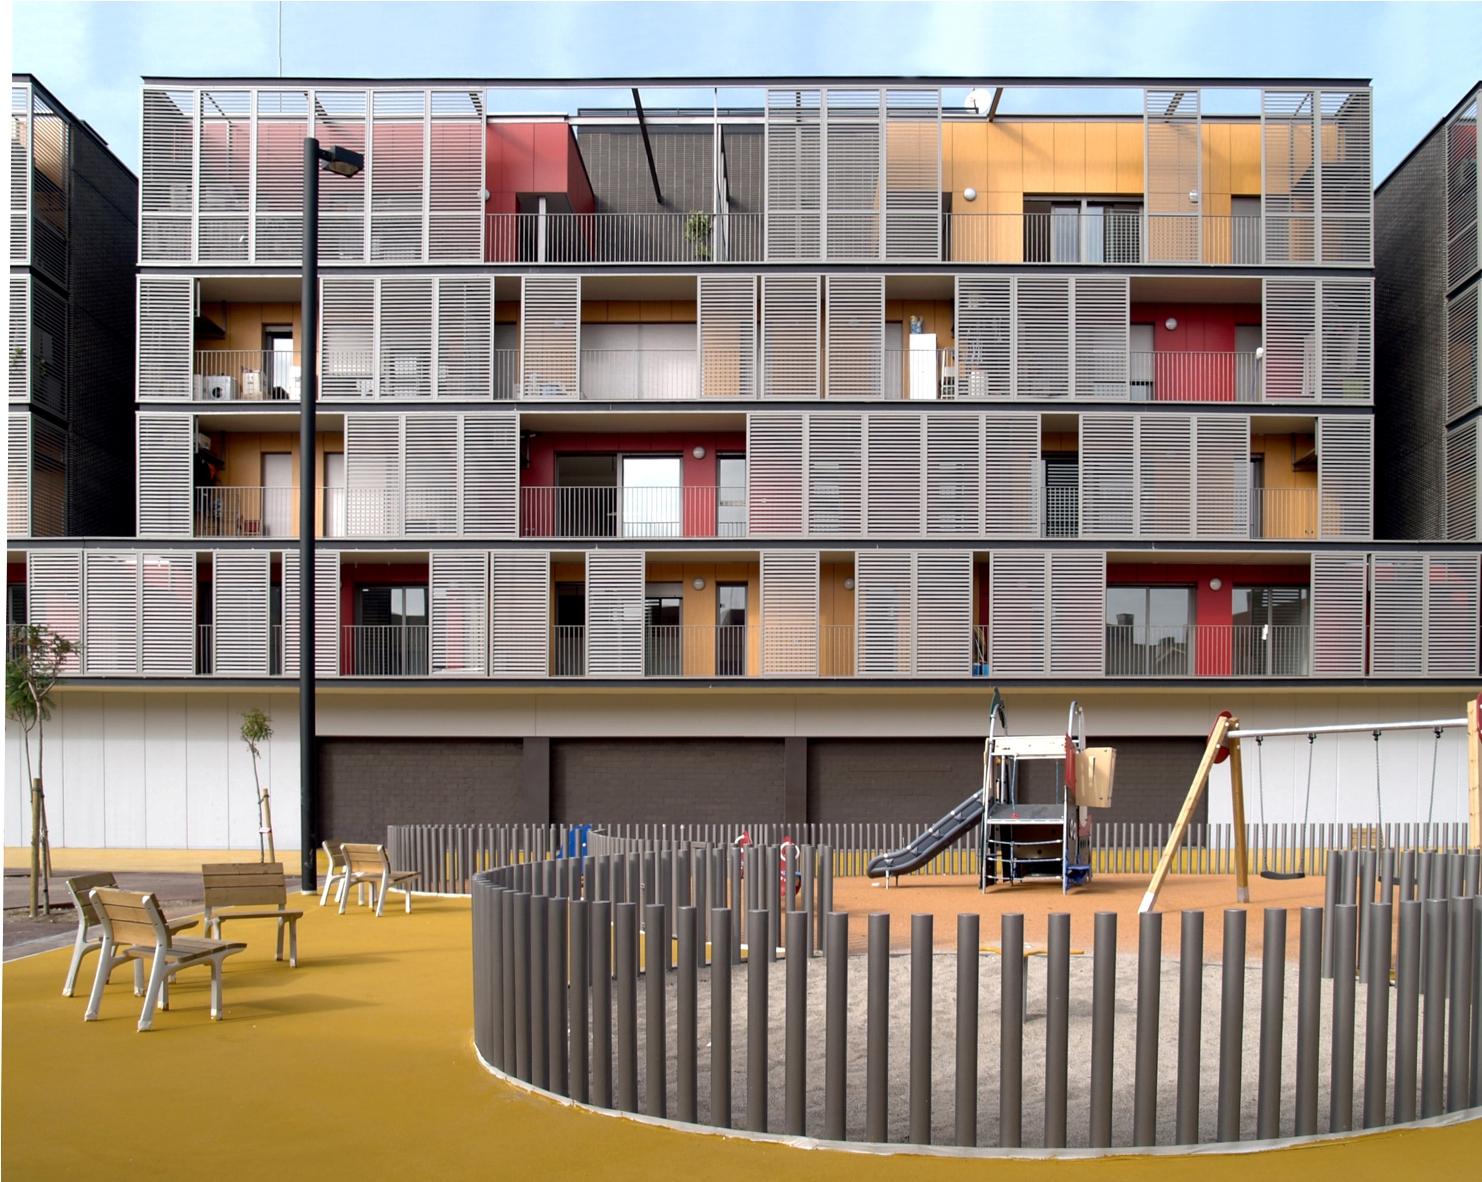 Conjunto Habitacional  Barcelona  concursosdeprojetoorg